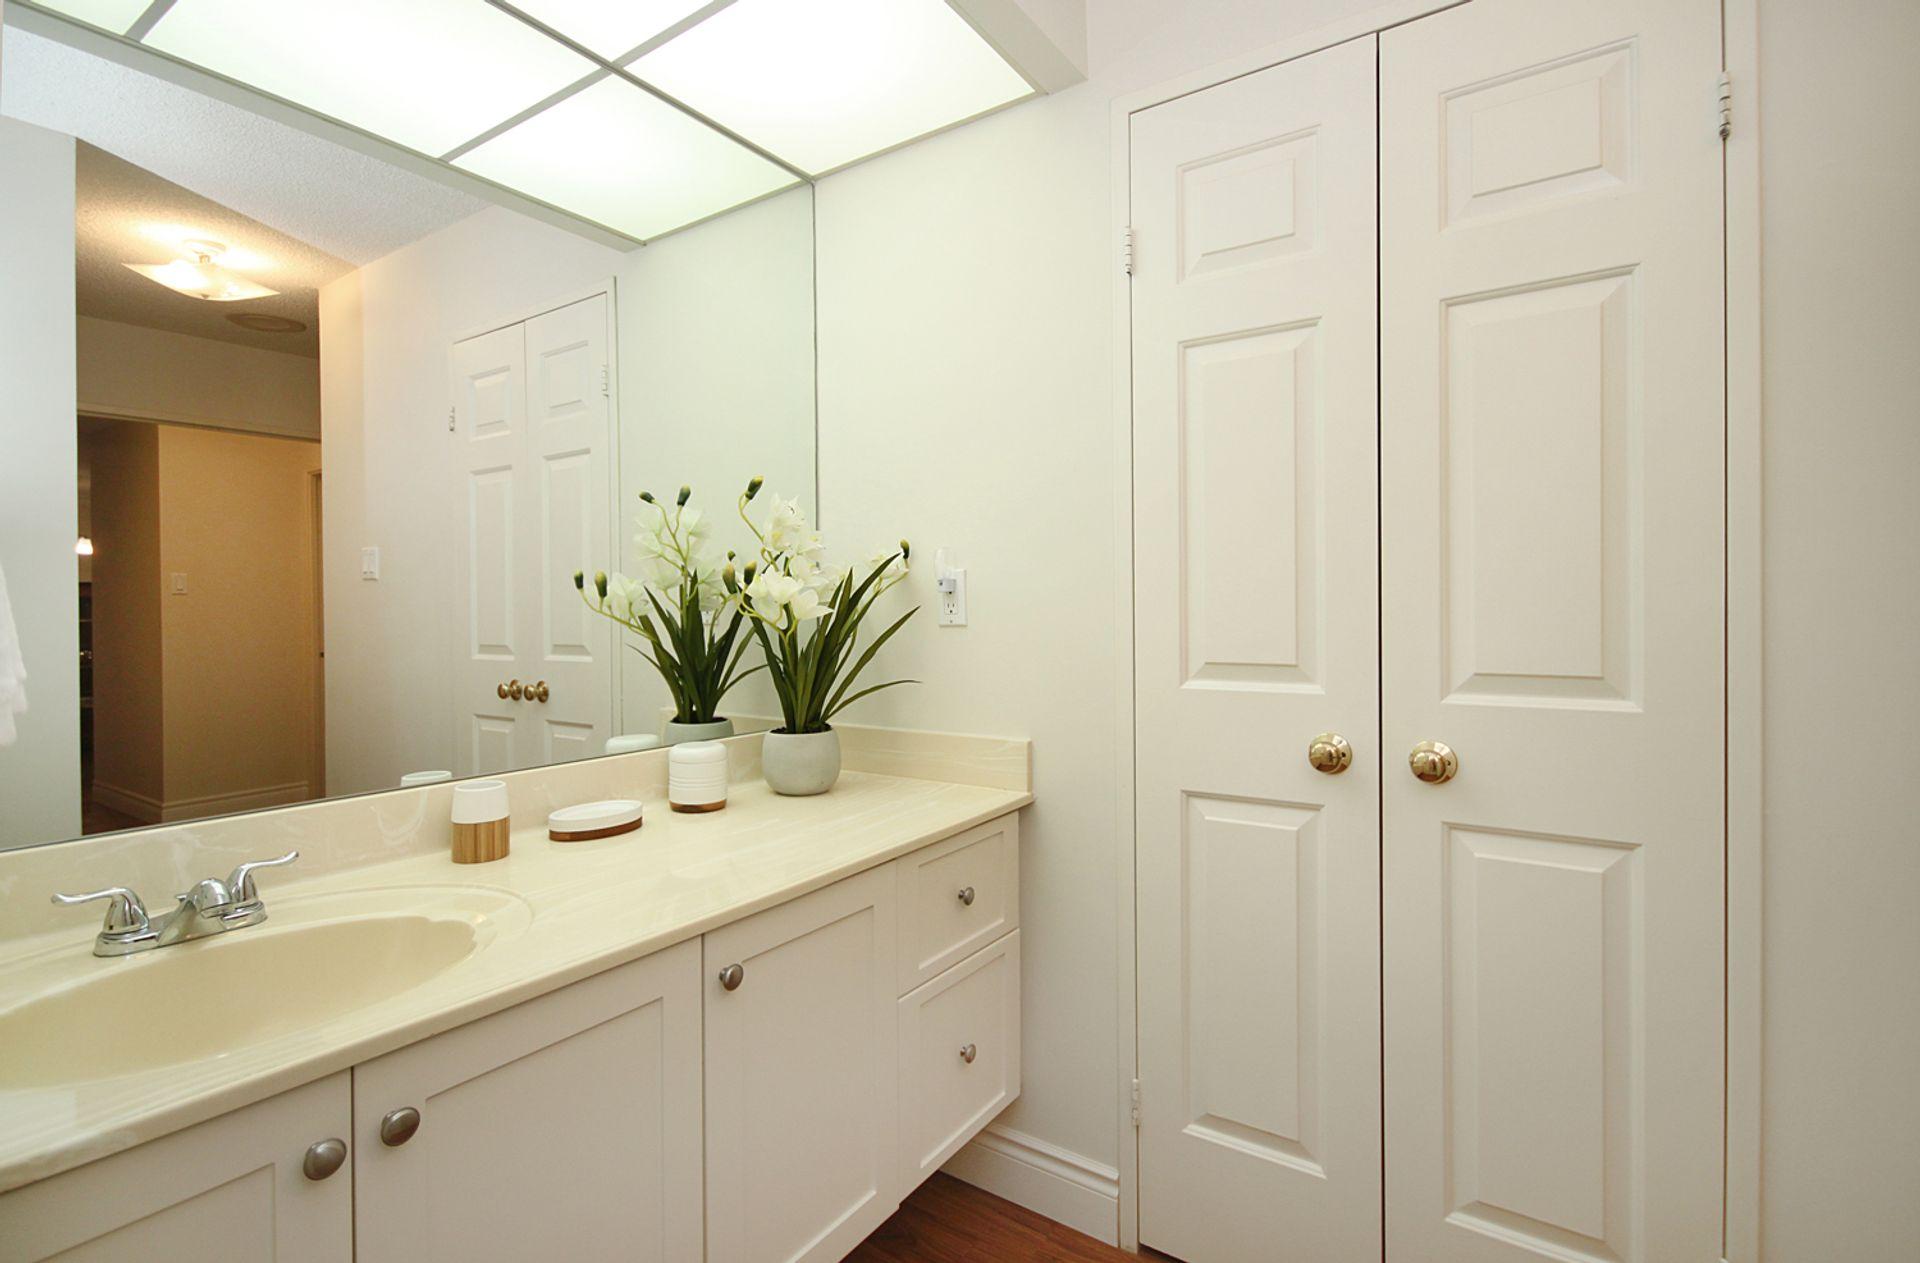 4 Piece Ensuite Bathroom at 209 - 131 Beecroft Road, Lansing-Westgate, Toronto